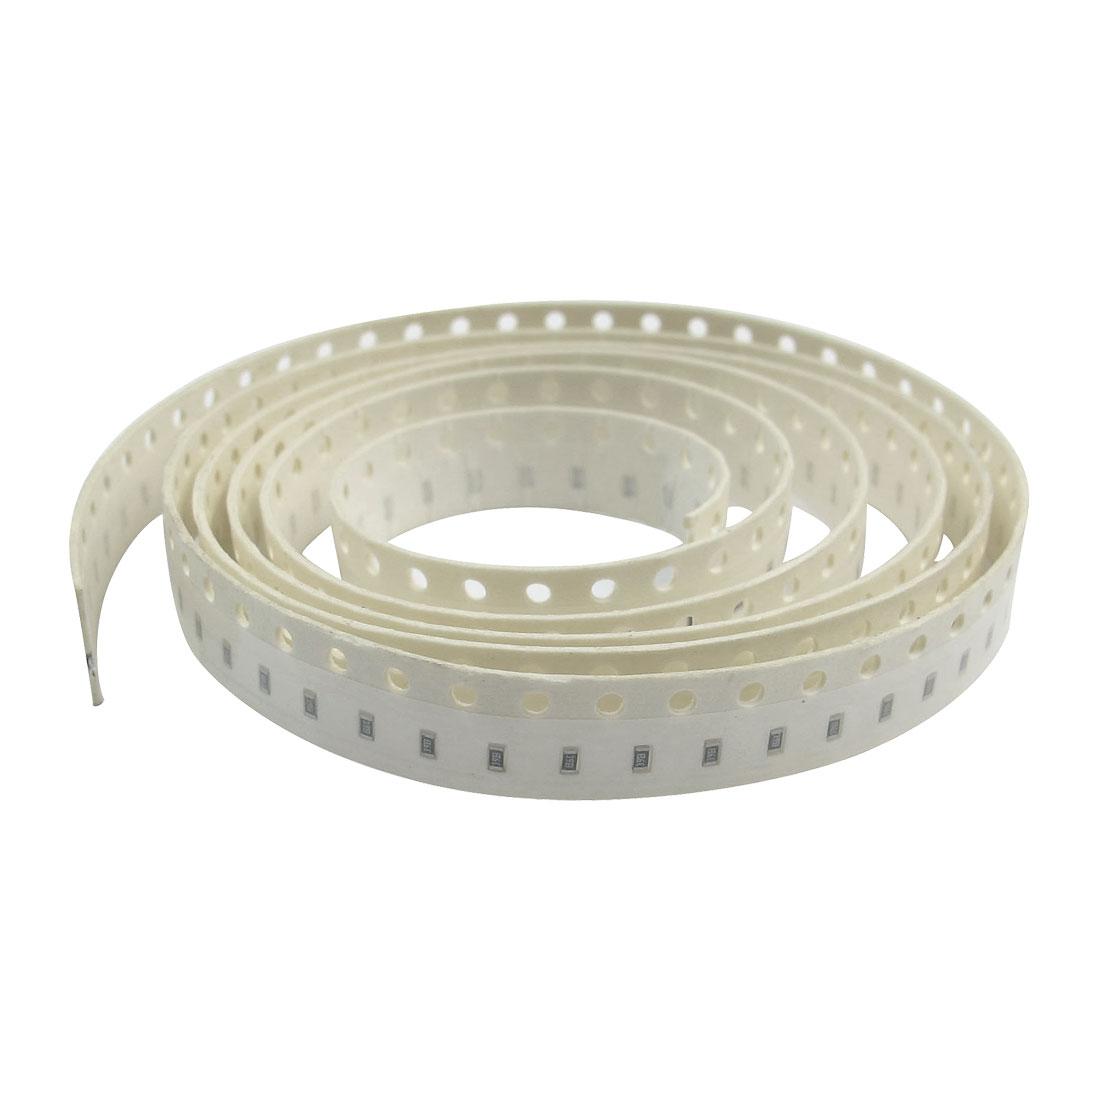 200 Pcs 0603 2.49K Ohm 1/10W 1% Tolerance Surface Mount Thin Film SMT SMD Chip Resistors